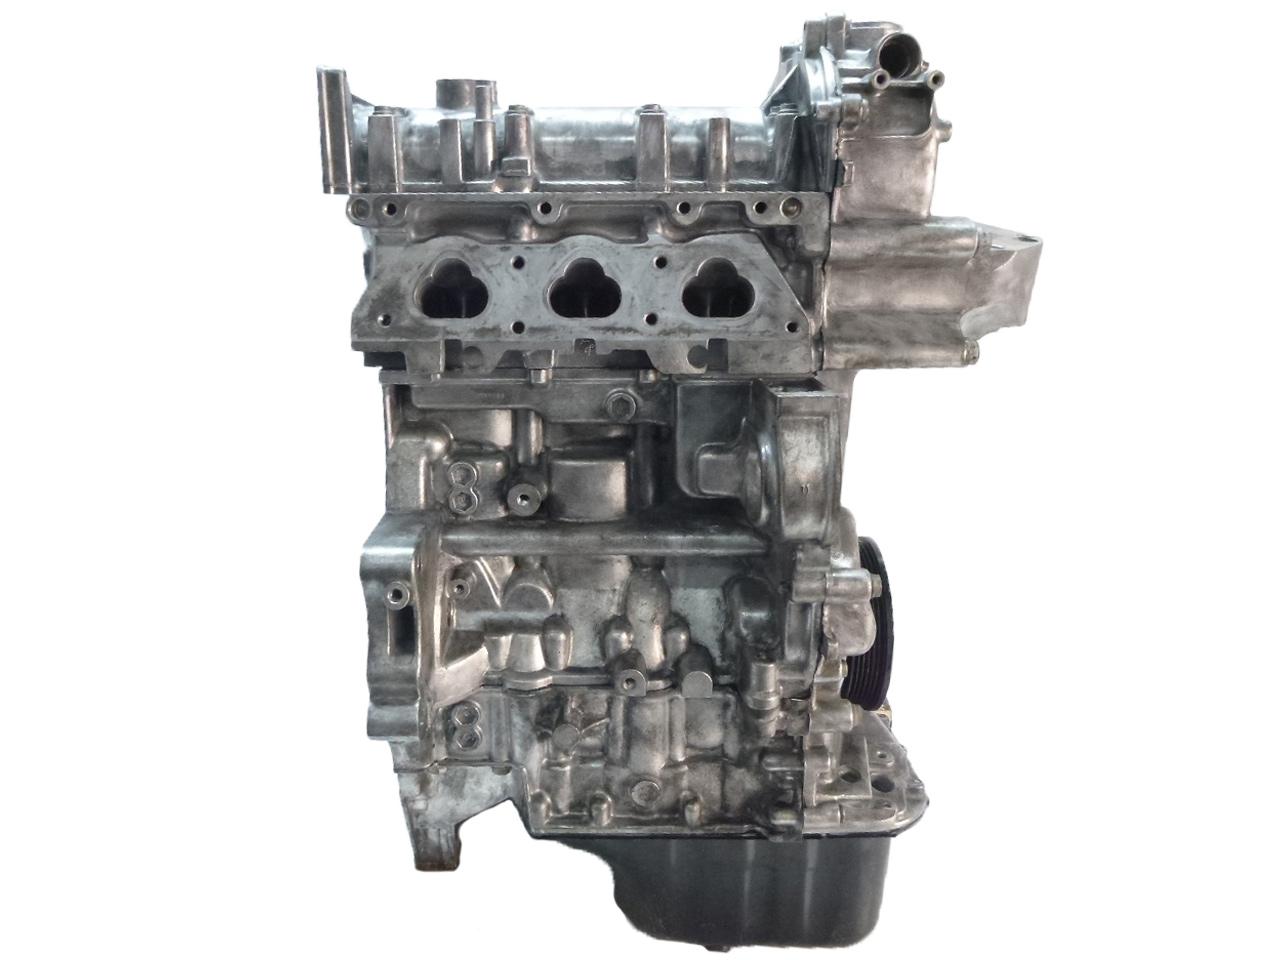 Motor Überholung Instandsetzung Reparatur VW Seat Skoda 1,2 12V AZQ BZG CEV